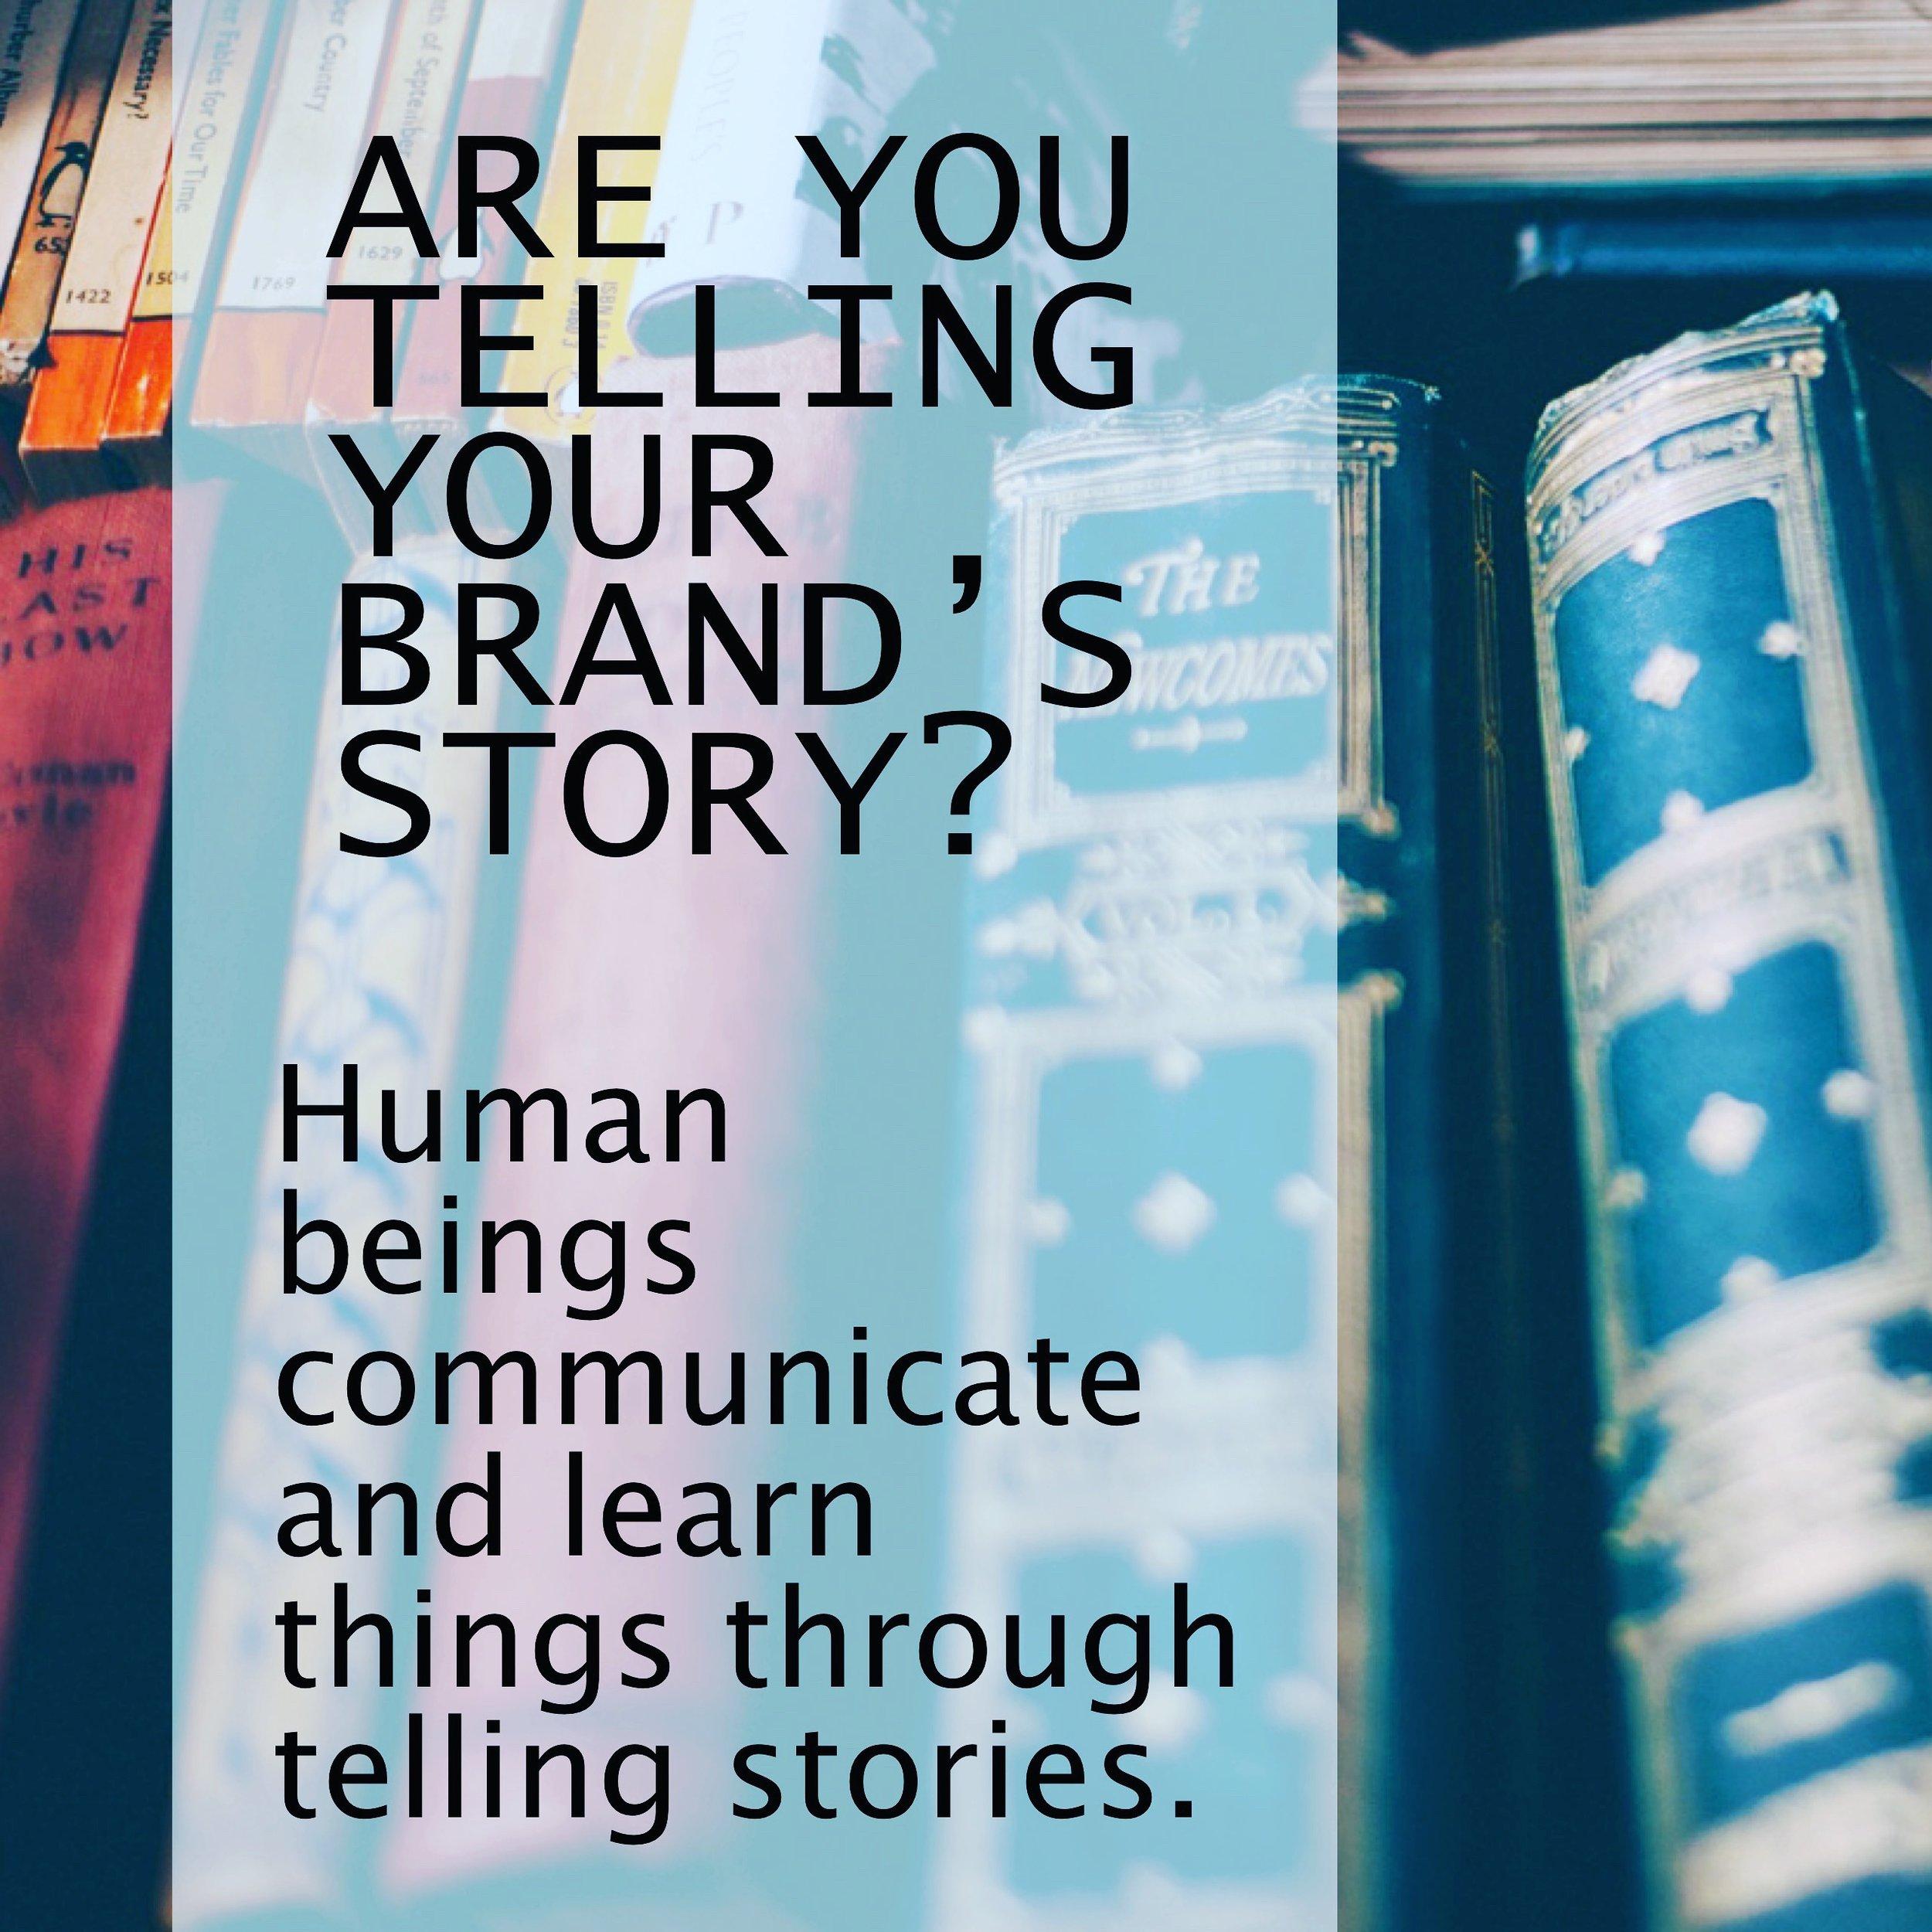 brand_story_telling.jpg